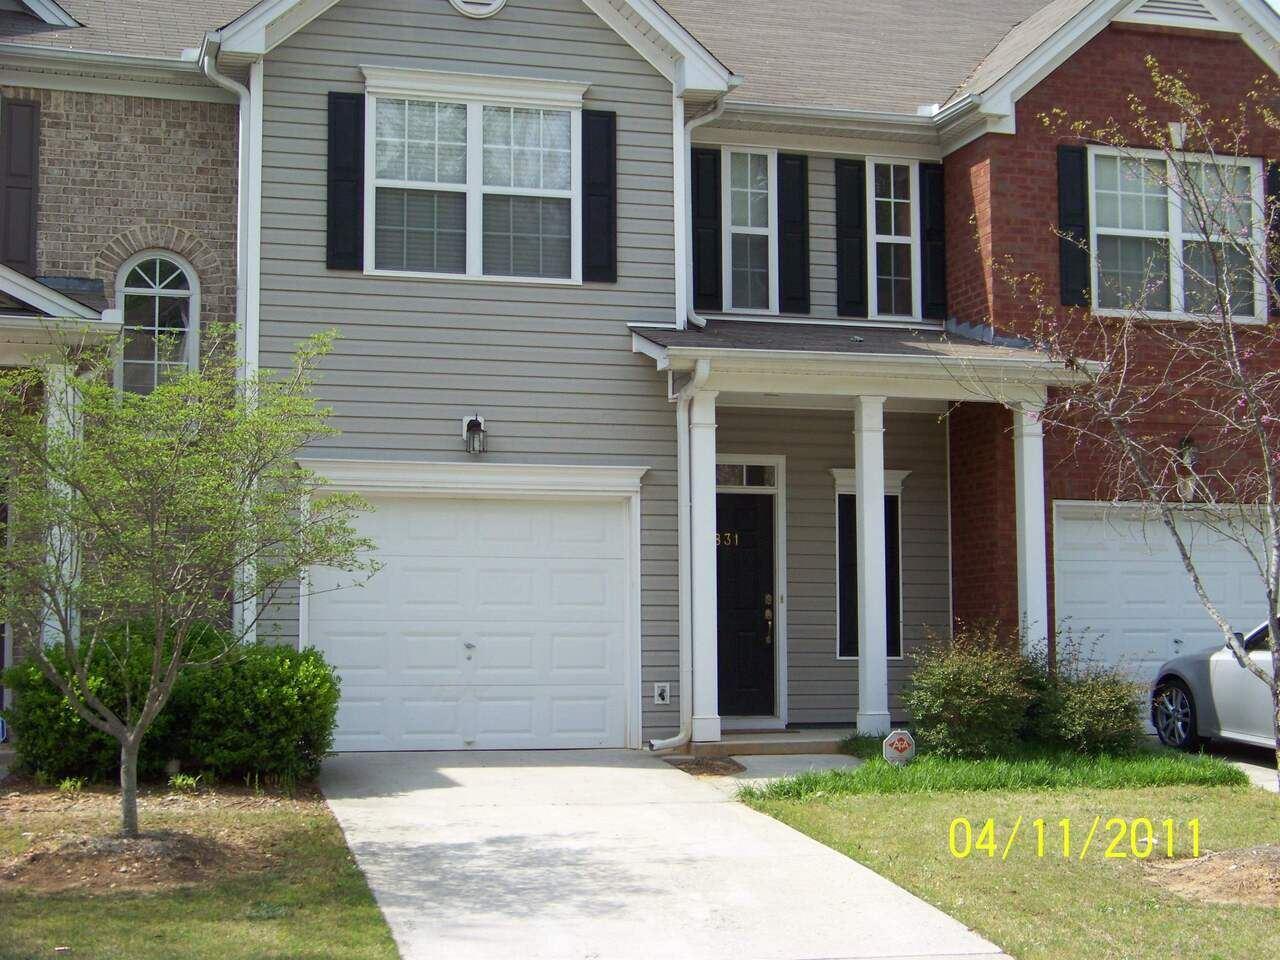 831 Rozie Way, Atlanta, GA 30331 - MLS#: 9050477